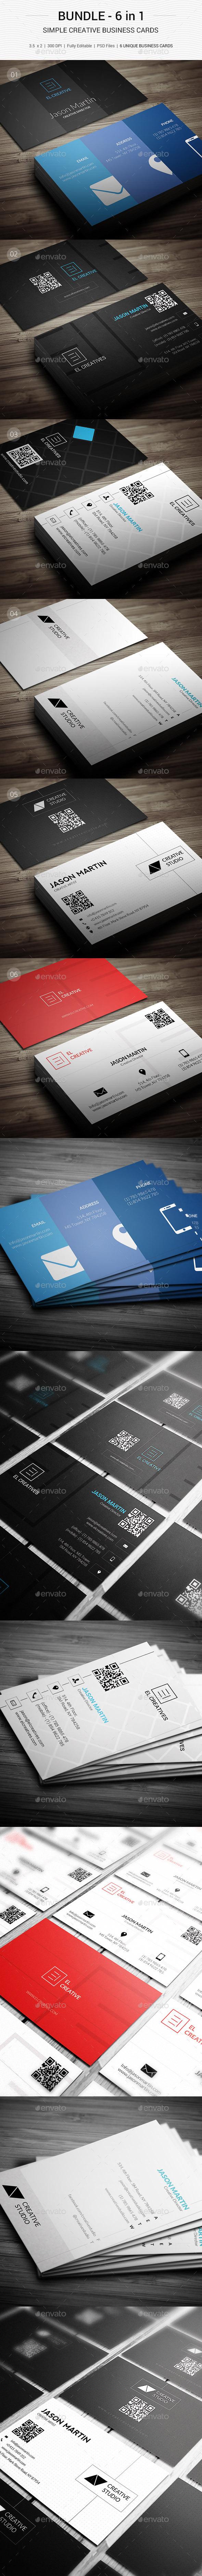 Bundle - Creative Simple Business Cards - 144 - Creative Business Cards